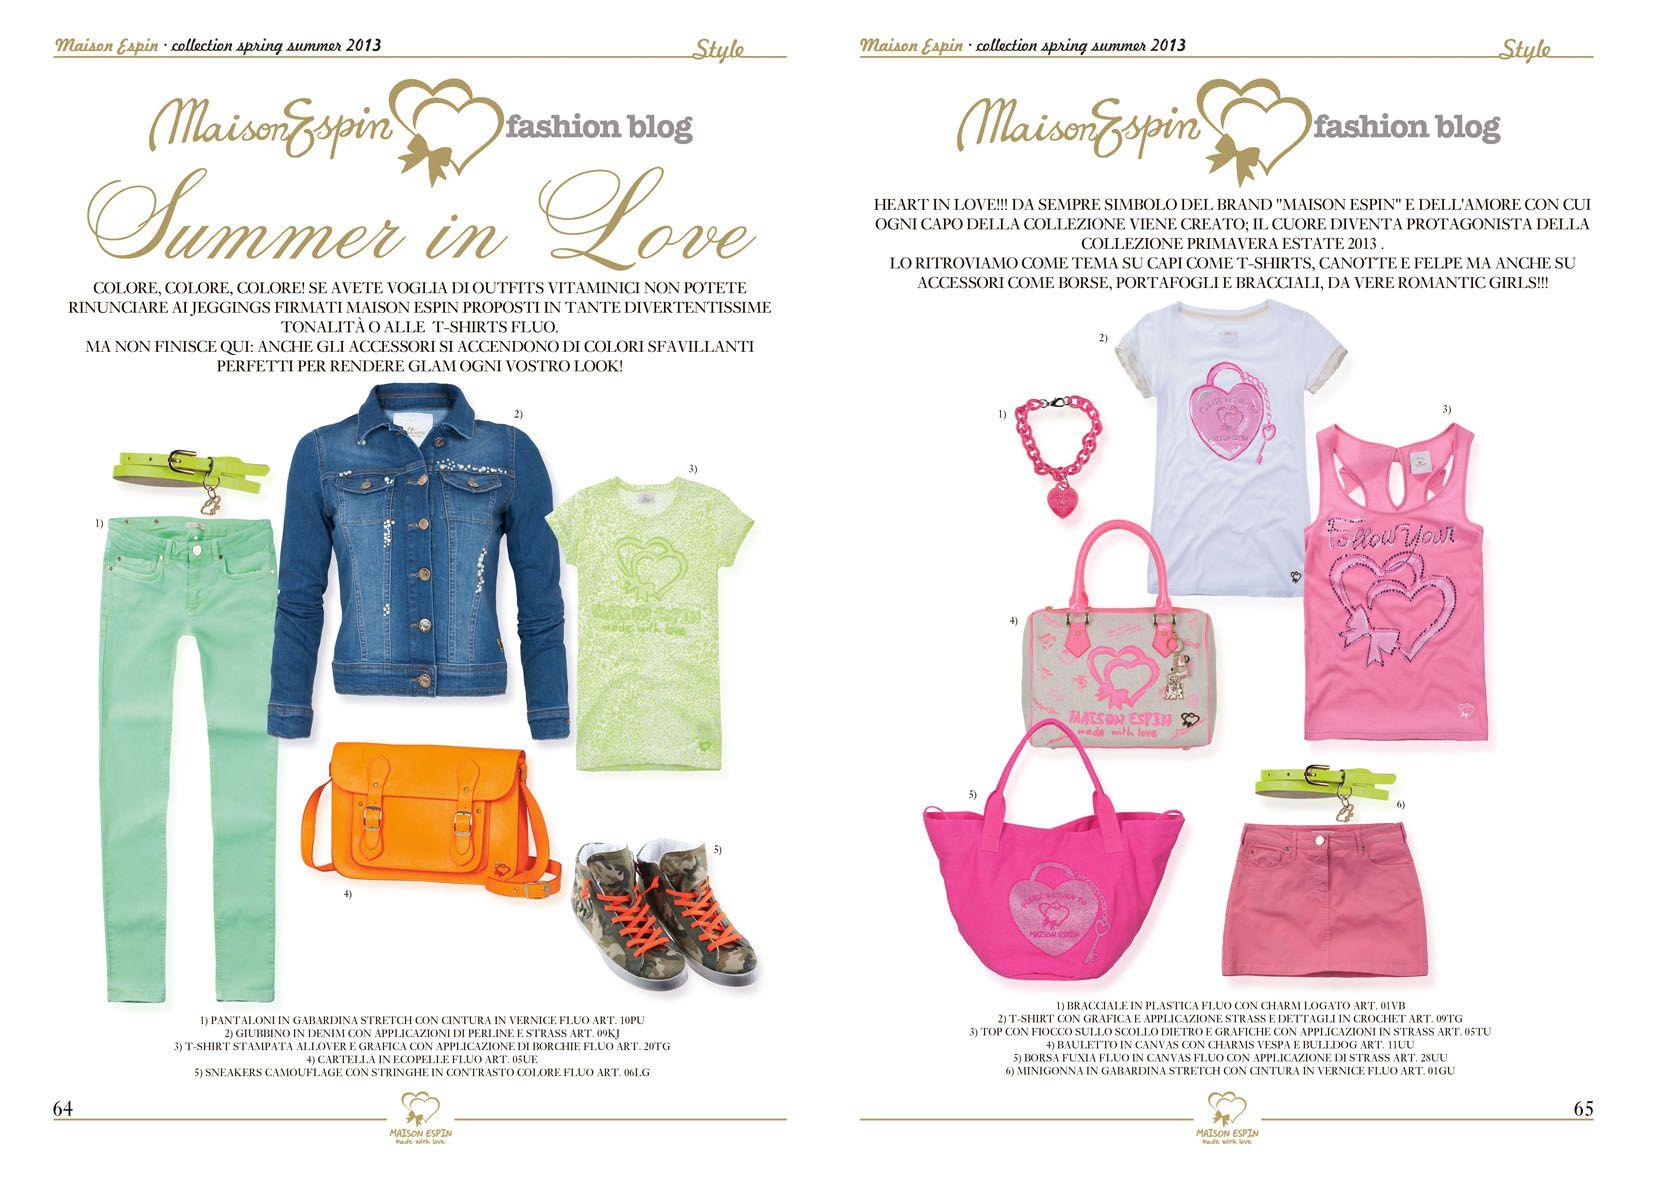 Maison Espin fashion blog #ginevra #Ginni #maisonespin #springsummercollection13 #womancollection#lovely #MadewithLove #romanticstyle #milano #fashionblog